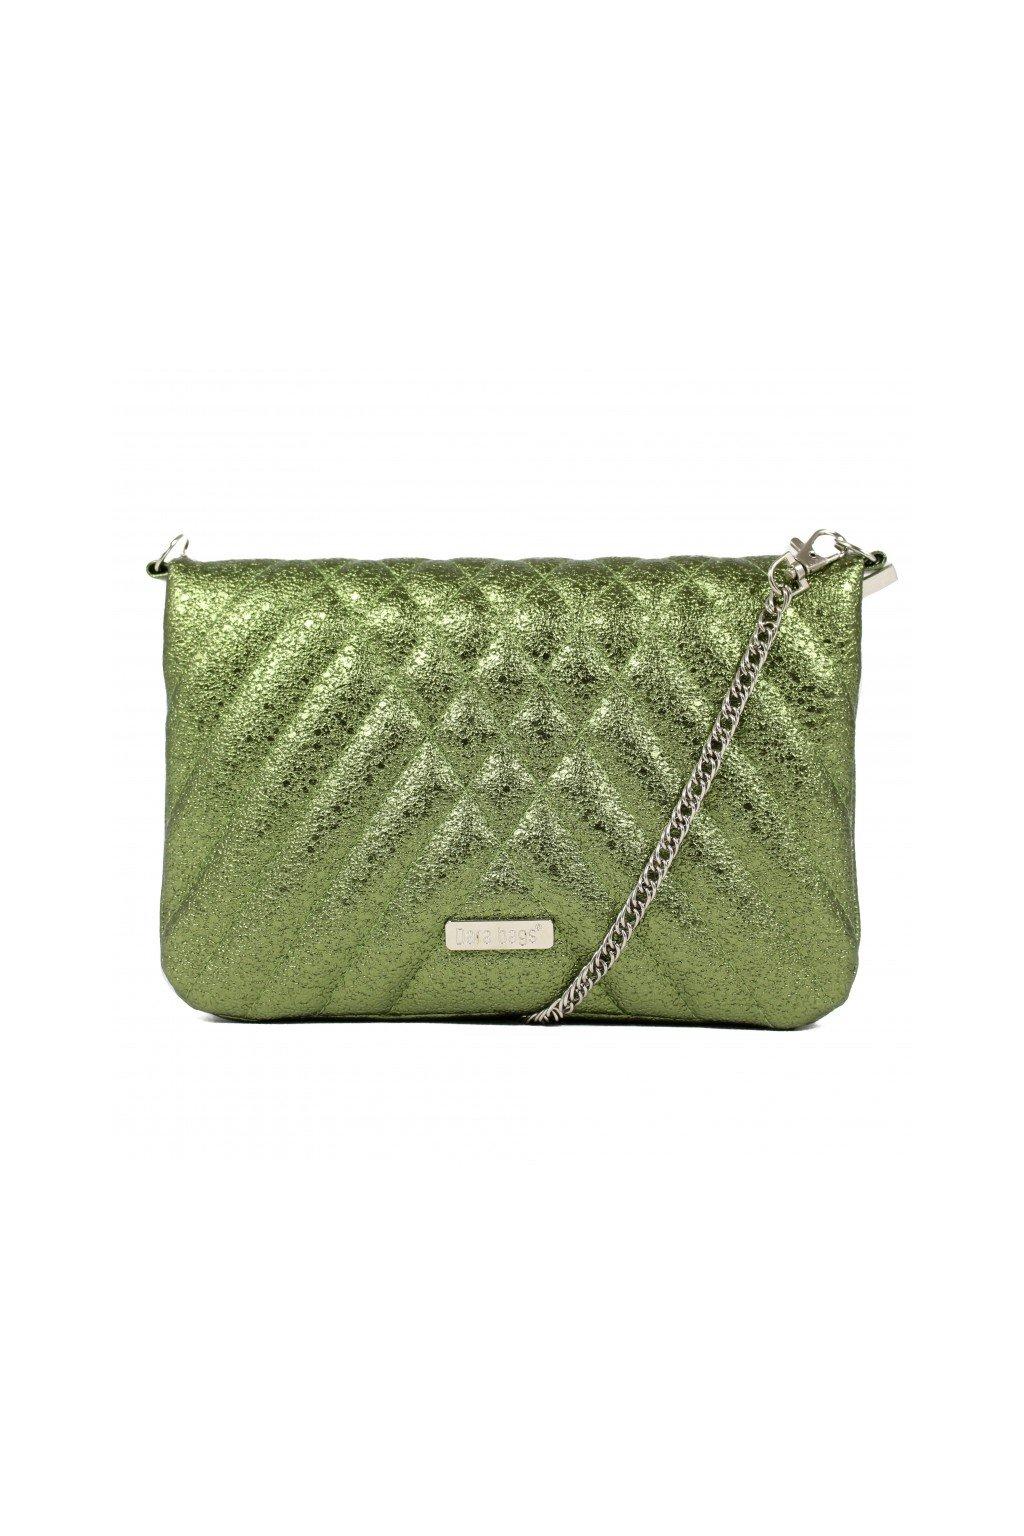 Třpytivá malá kabelka Cocktail Chick Dara bags zelená 1